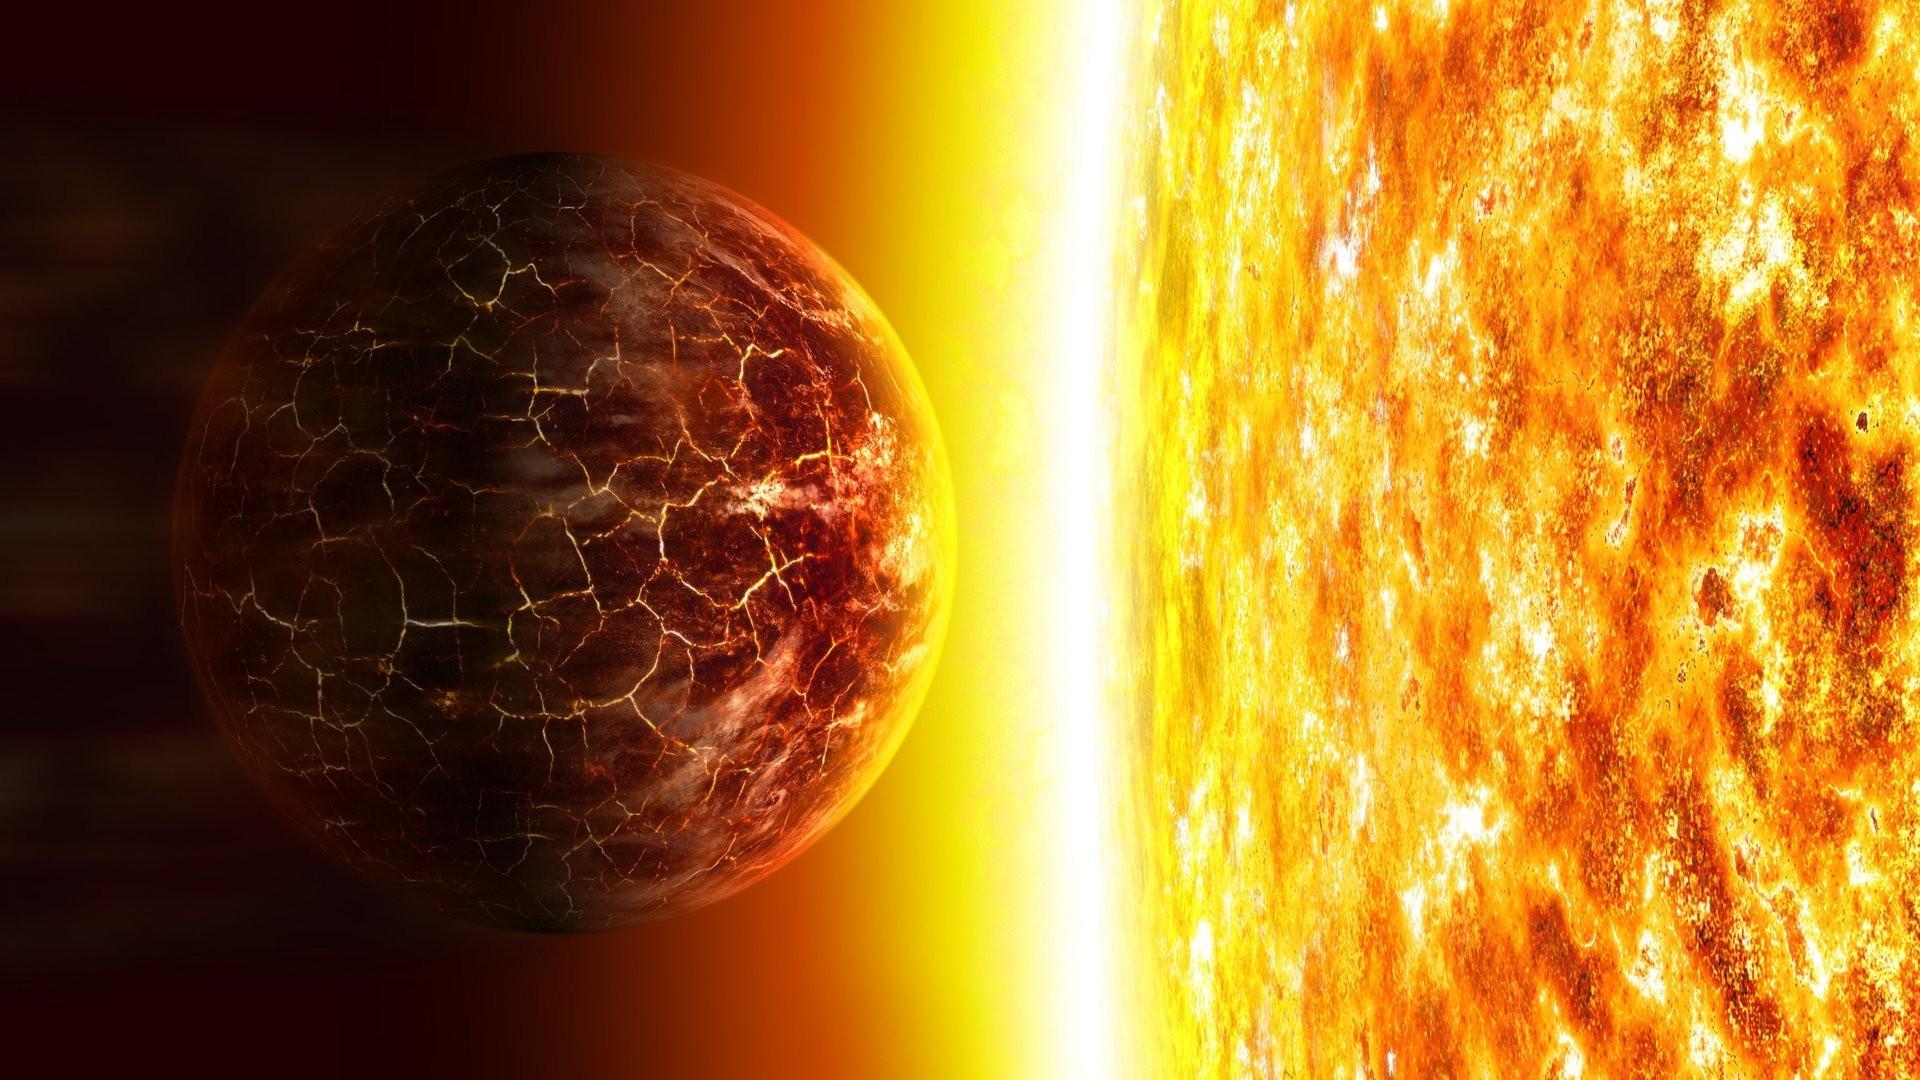 Sun Sci Fi wallpapers HD quality